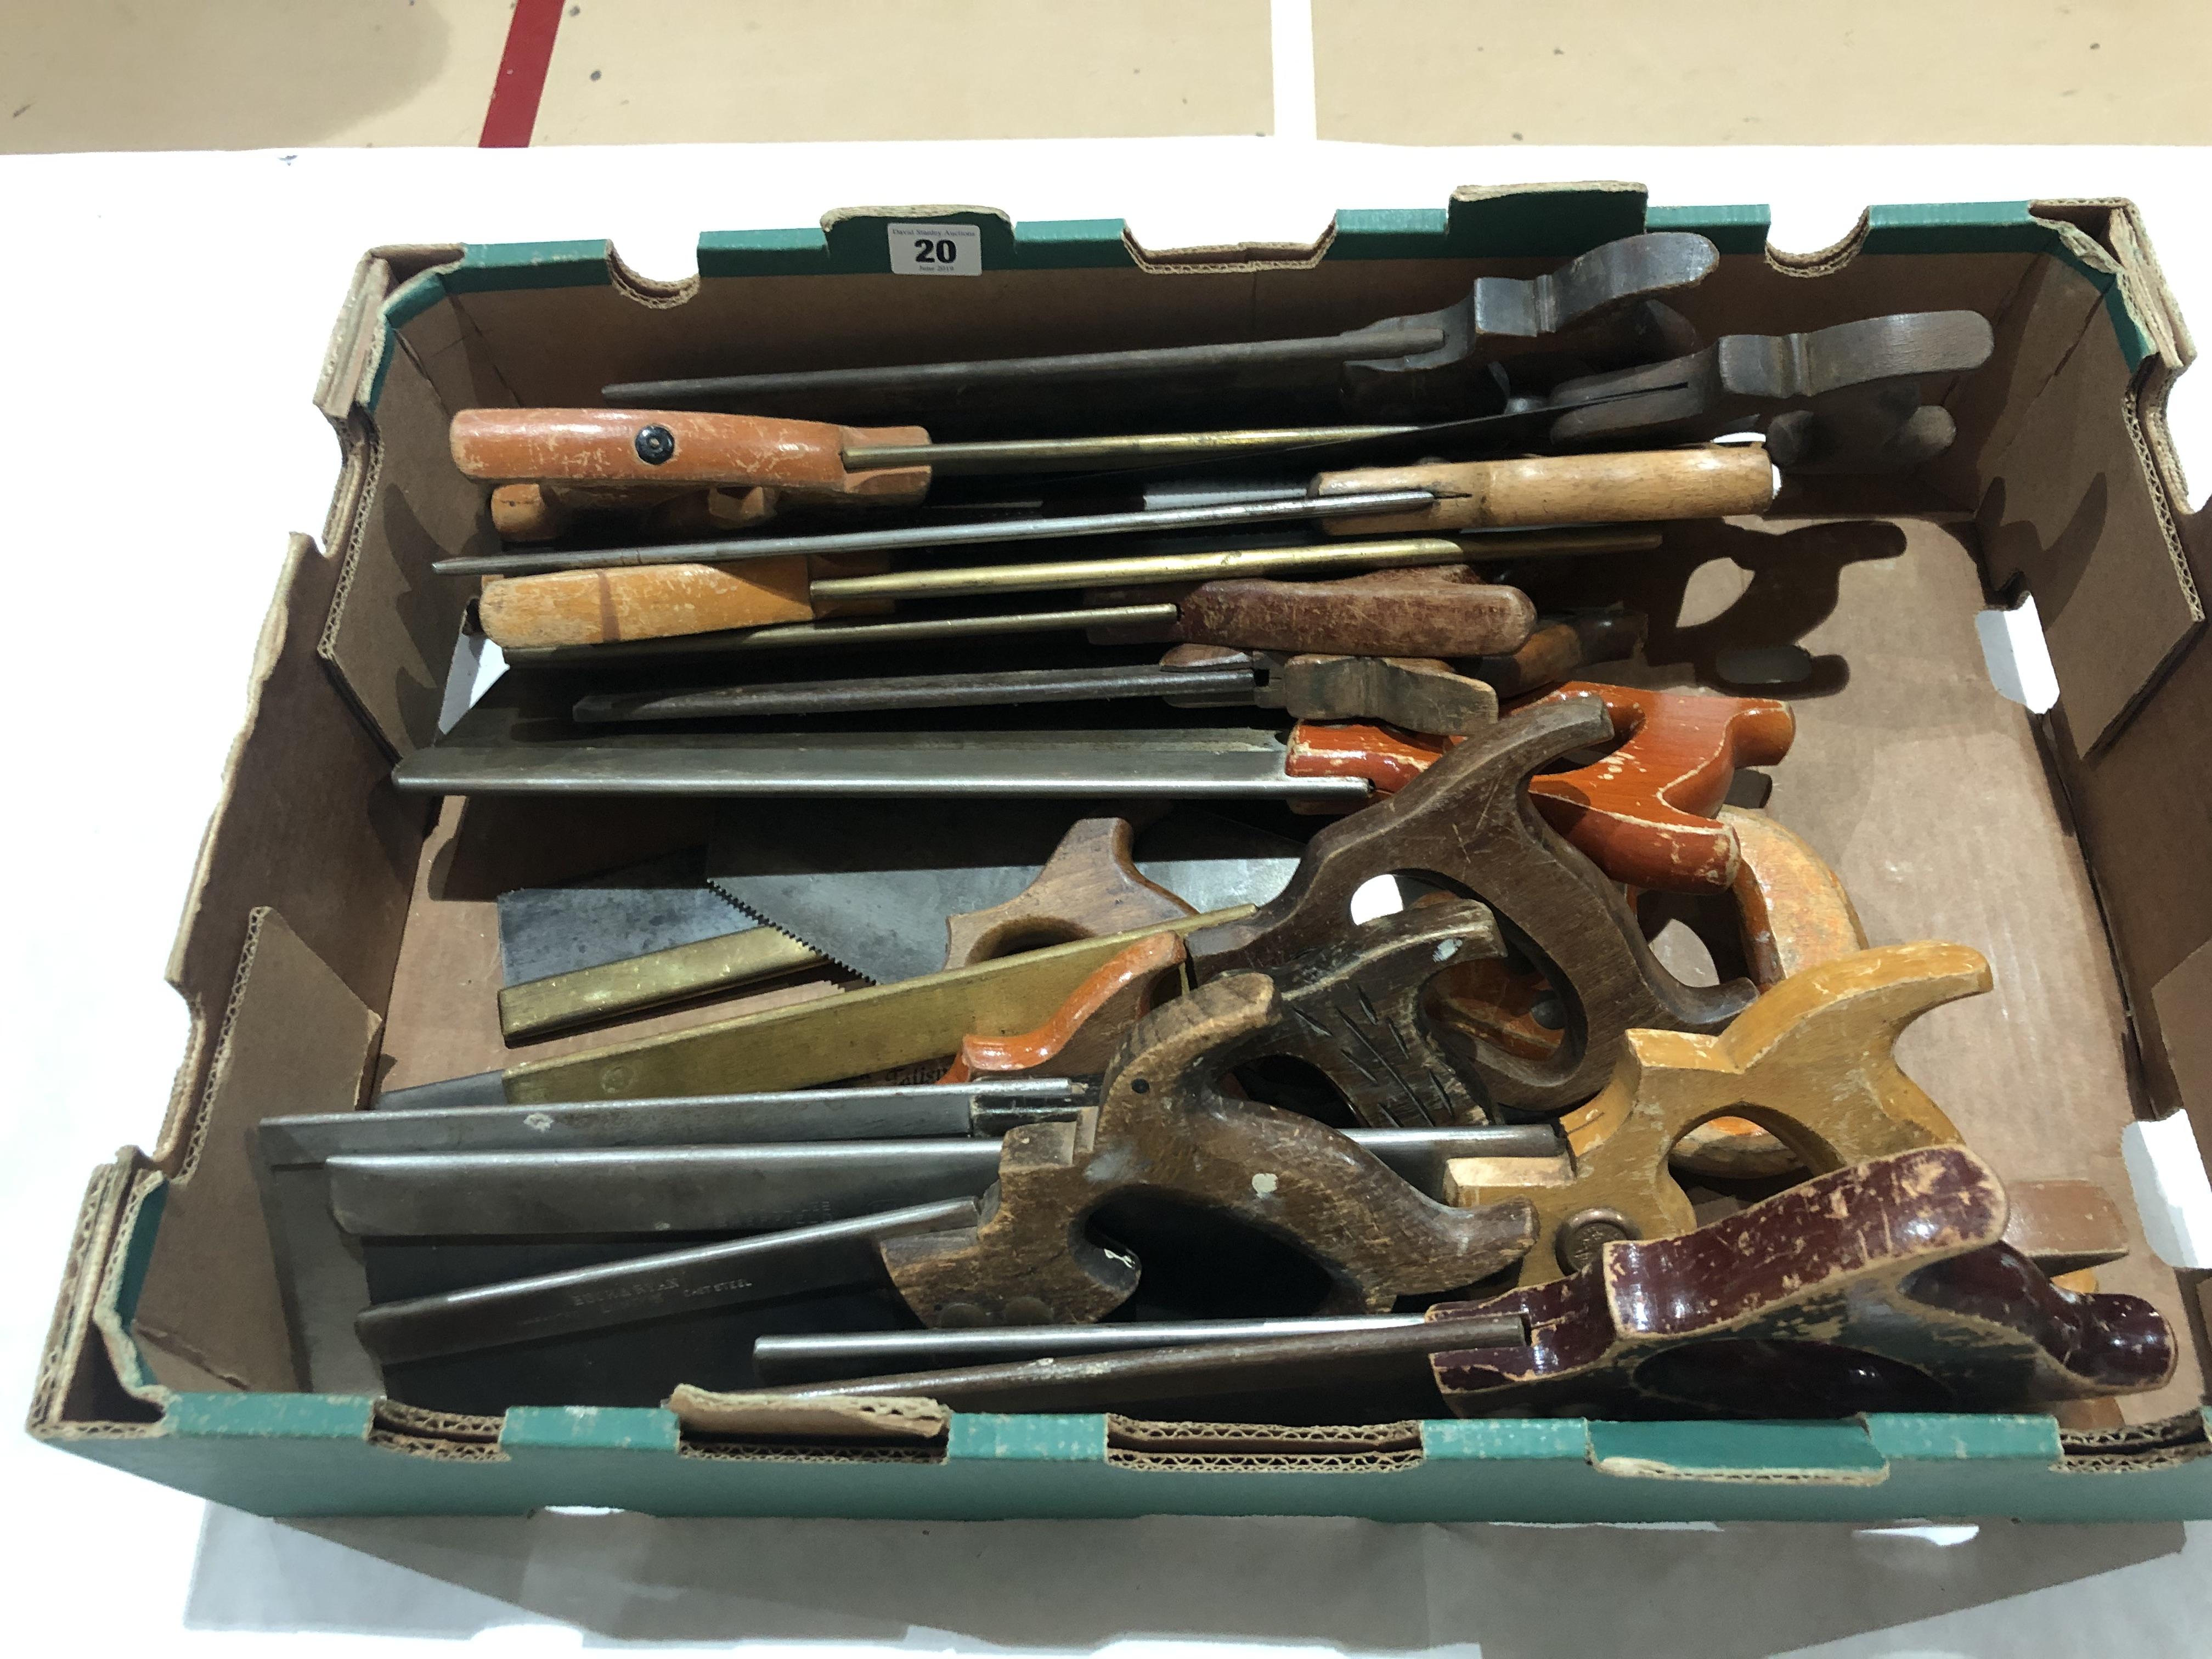 Lot 20 - 16 tenon saws G